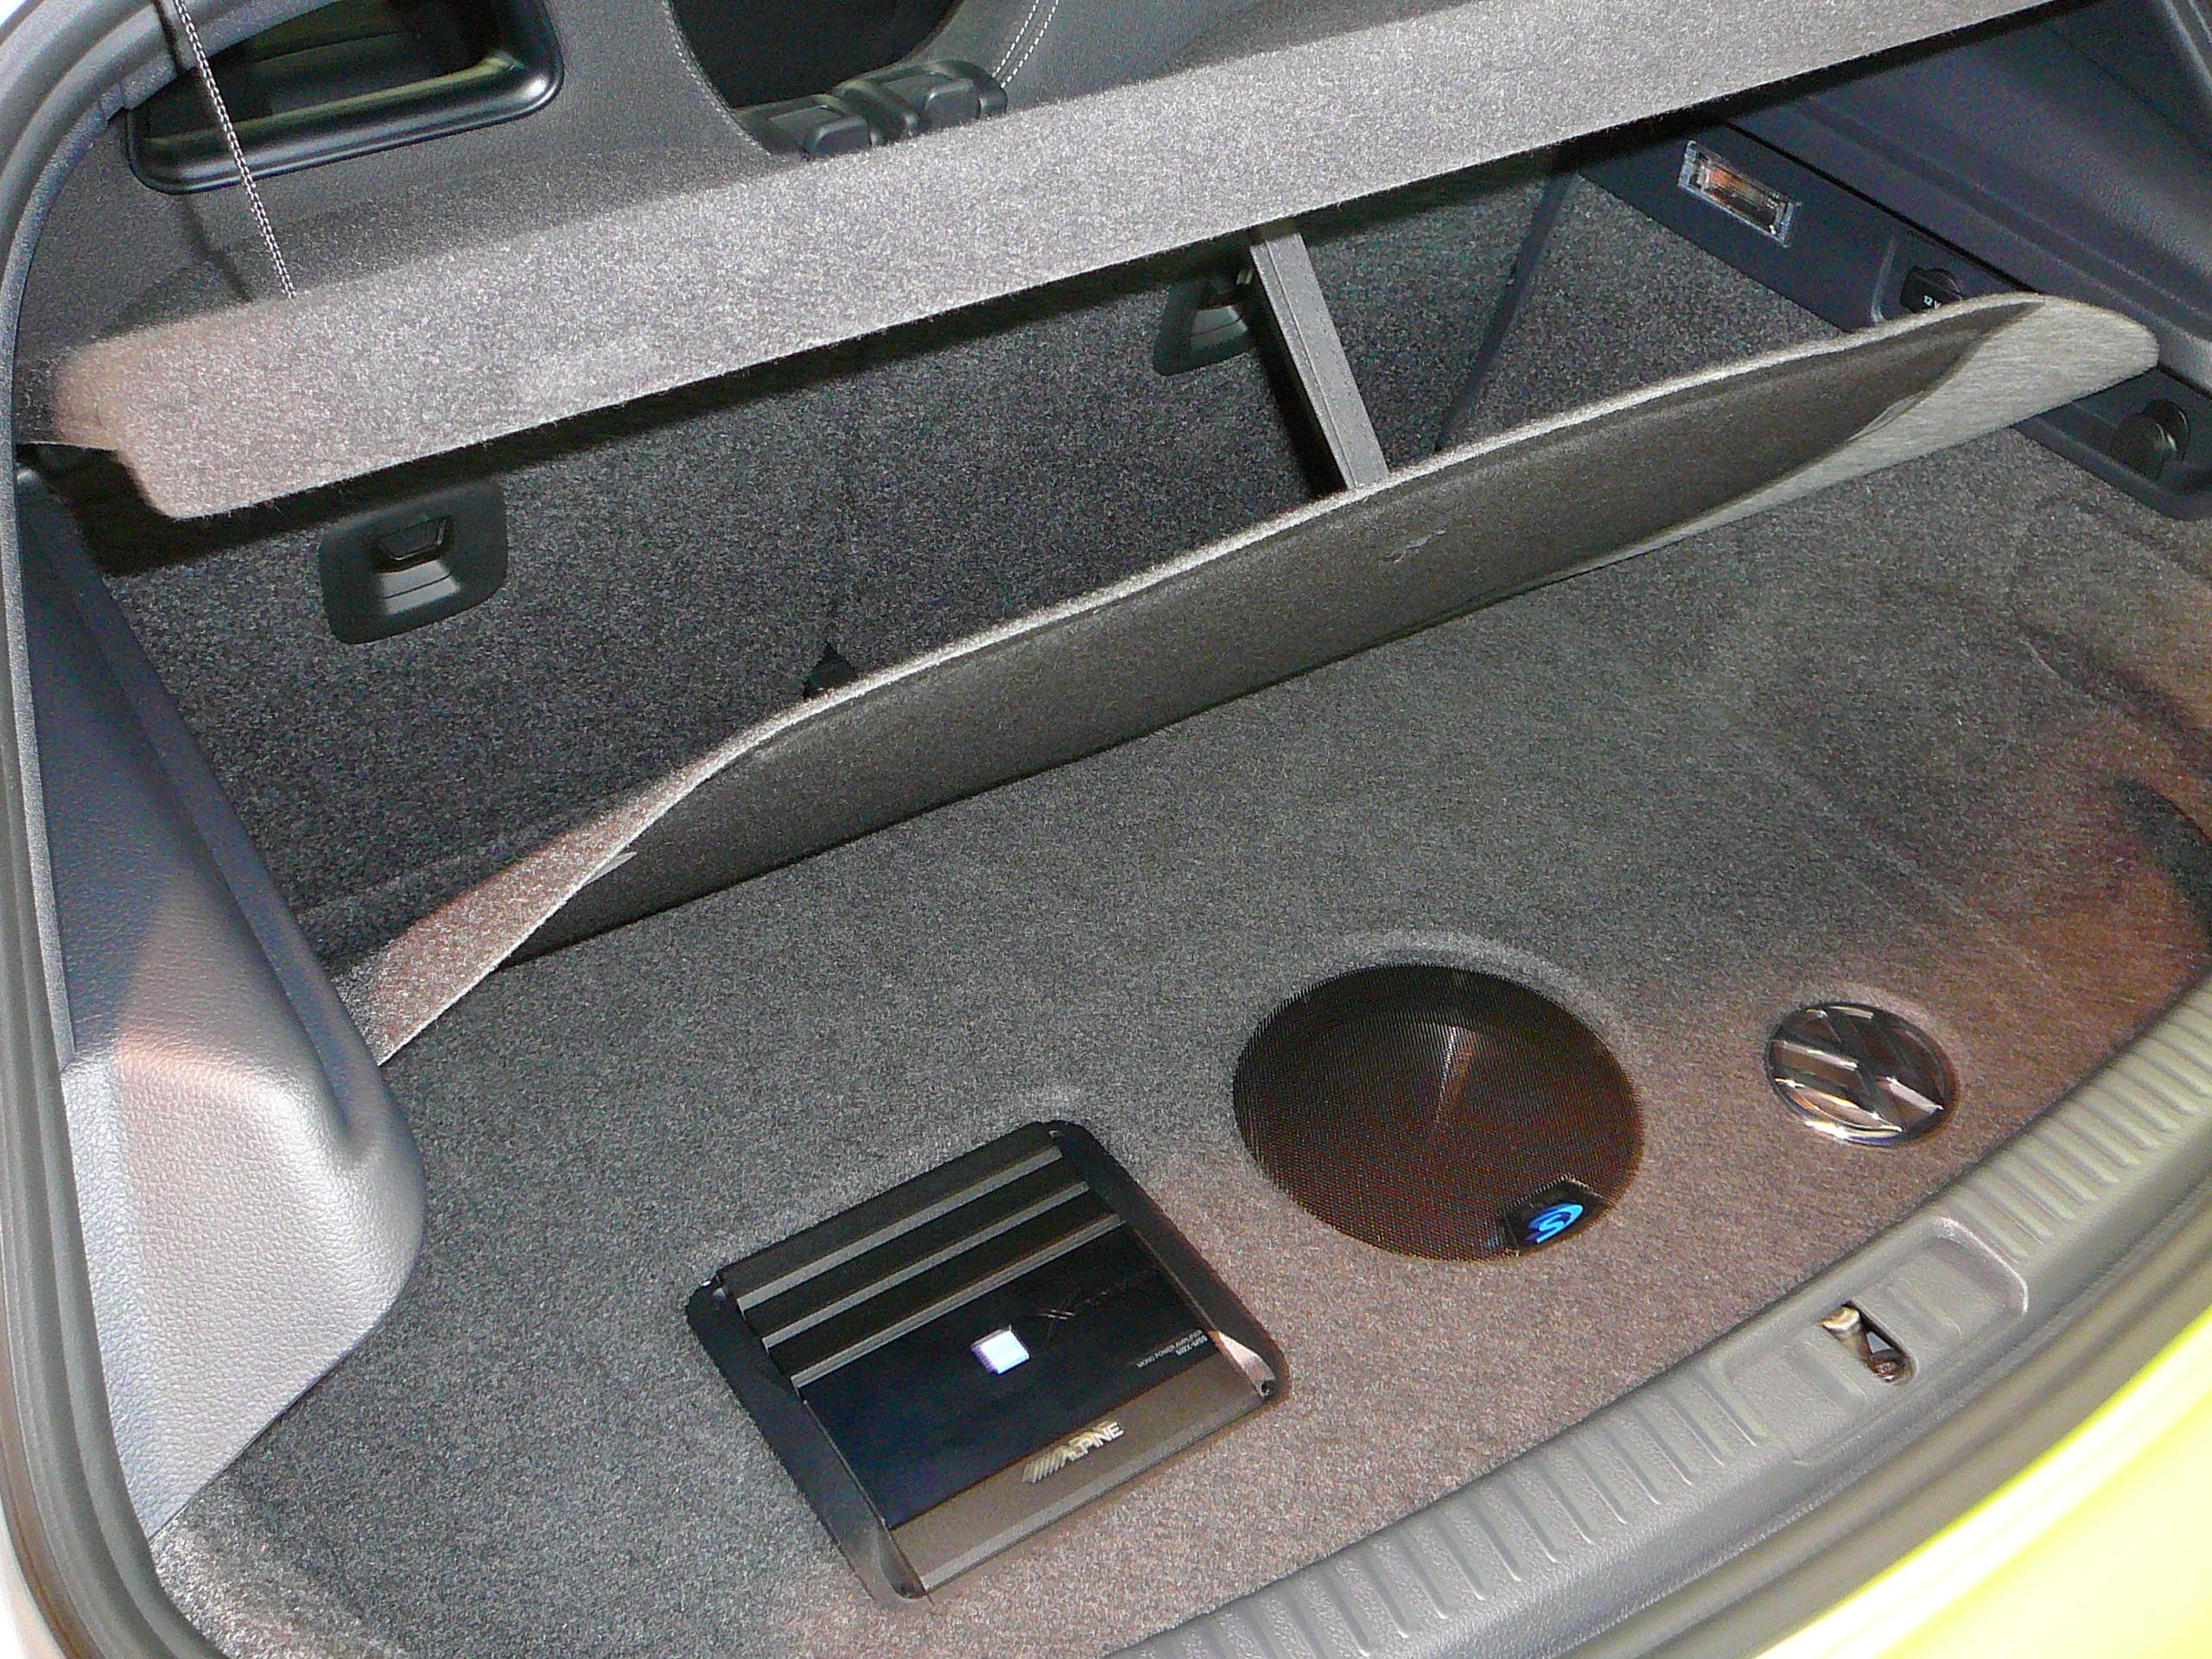 Volkswagen Scirocco R 2012, Custom Sub Box and Amplifier Installation